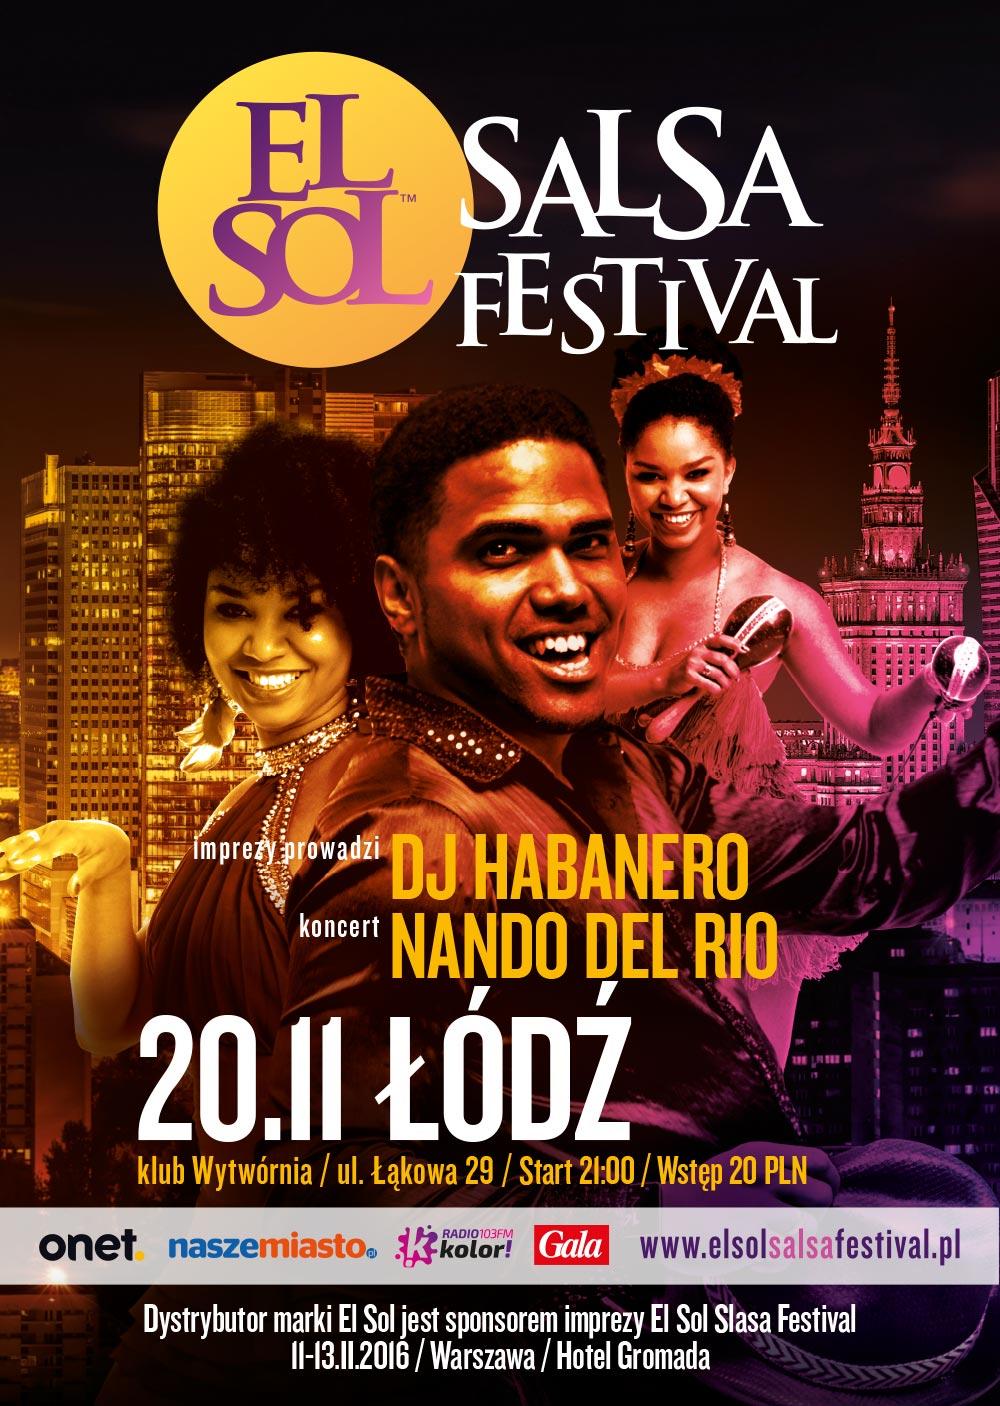 ElSol-festival-slasy-B2--6